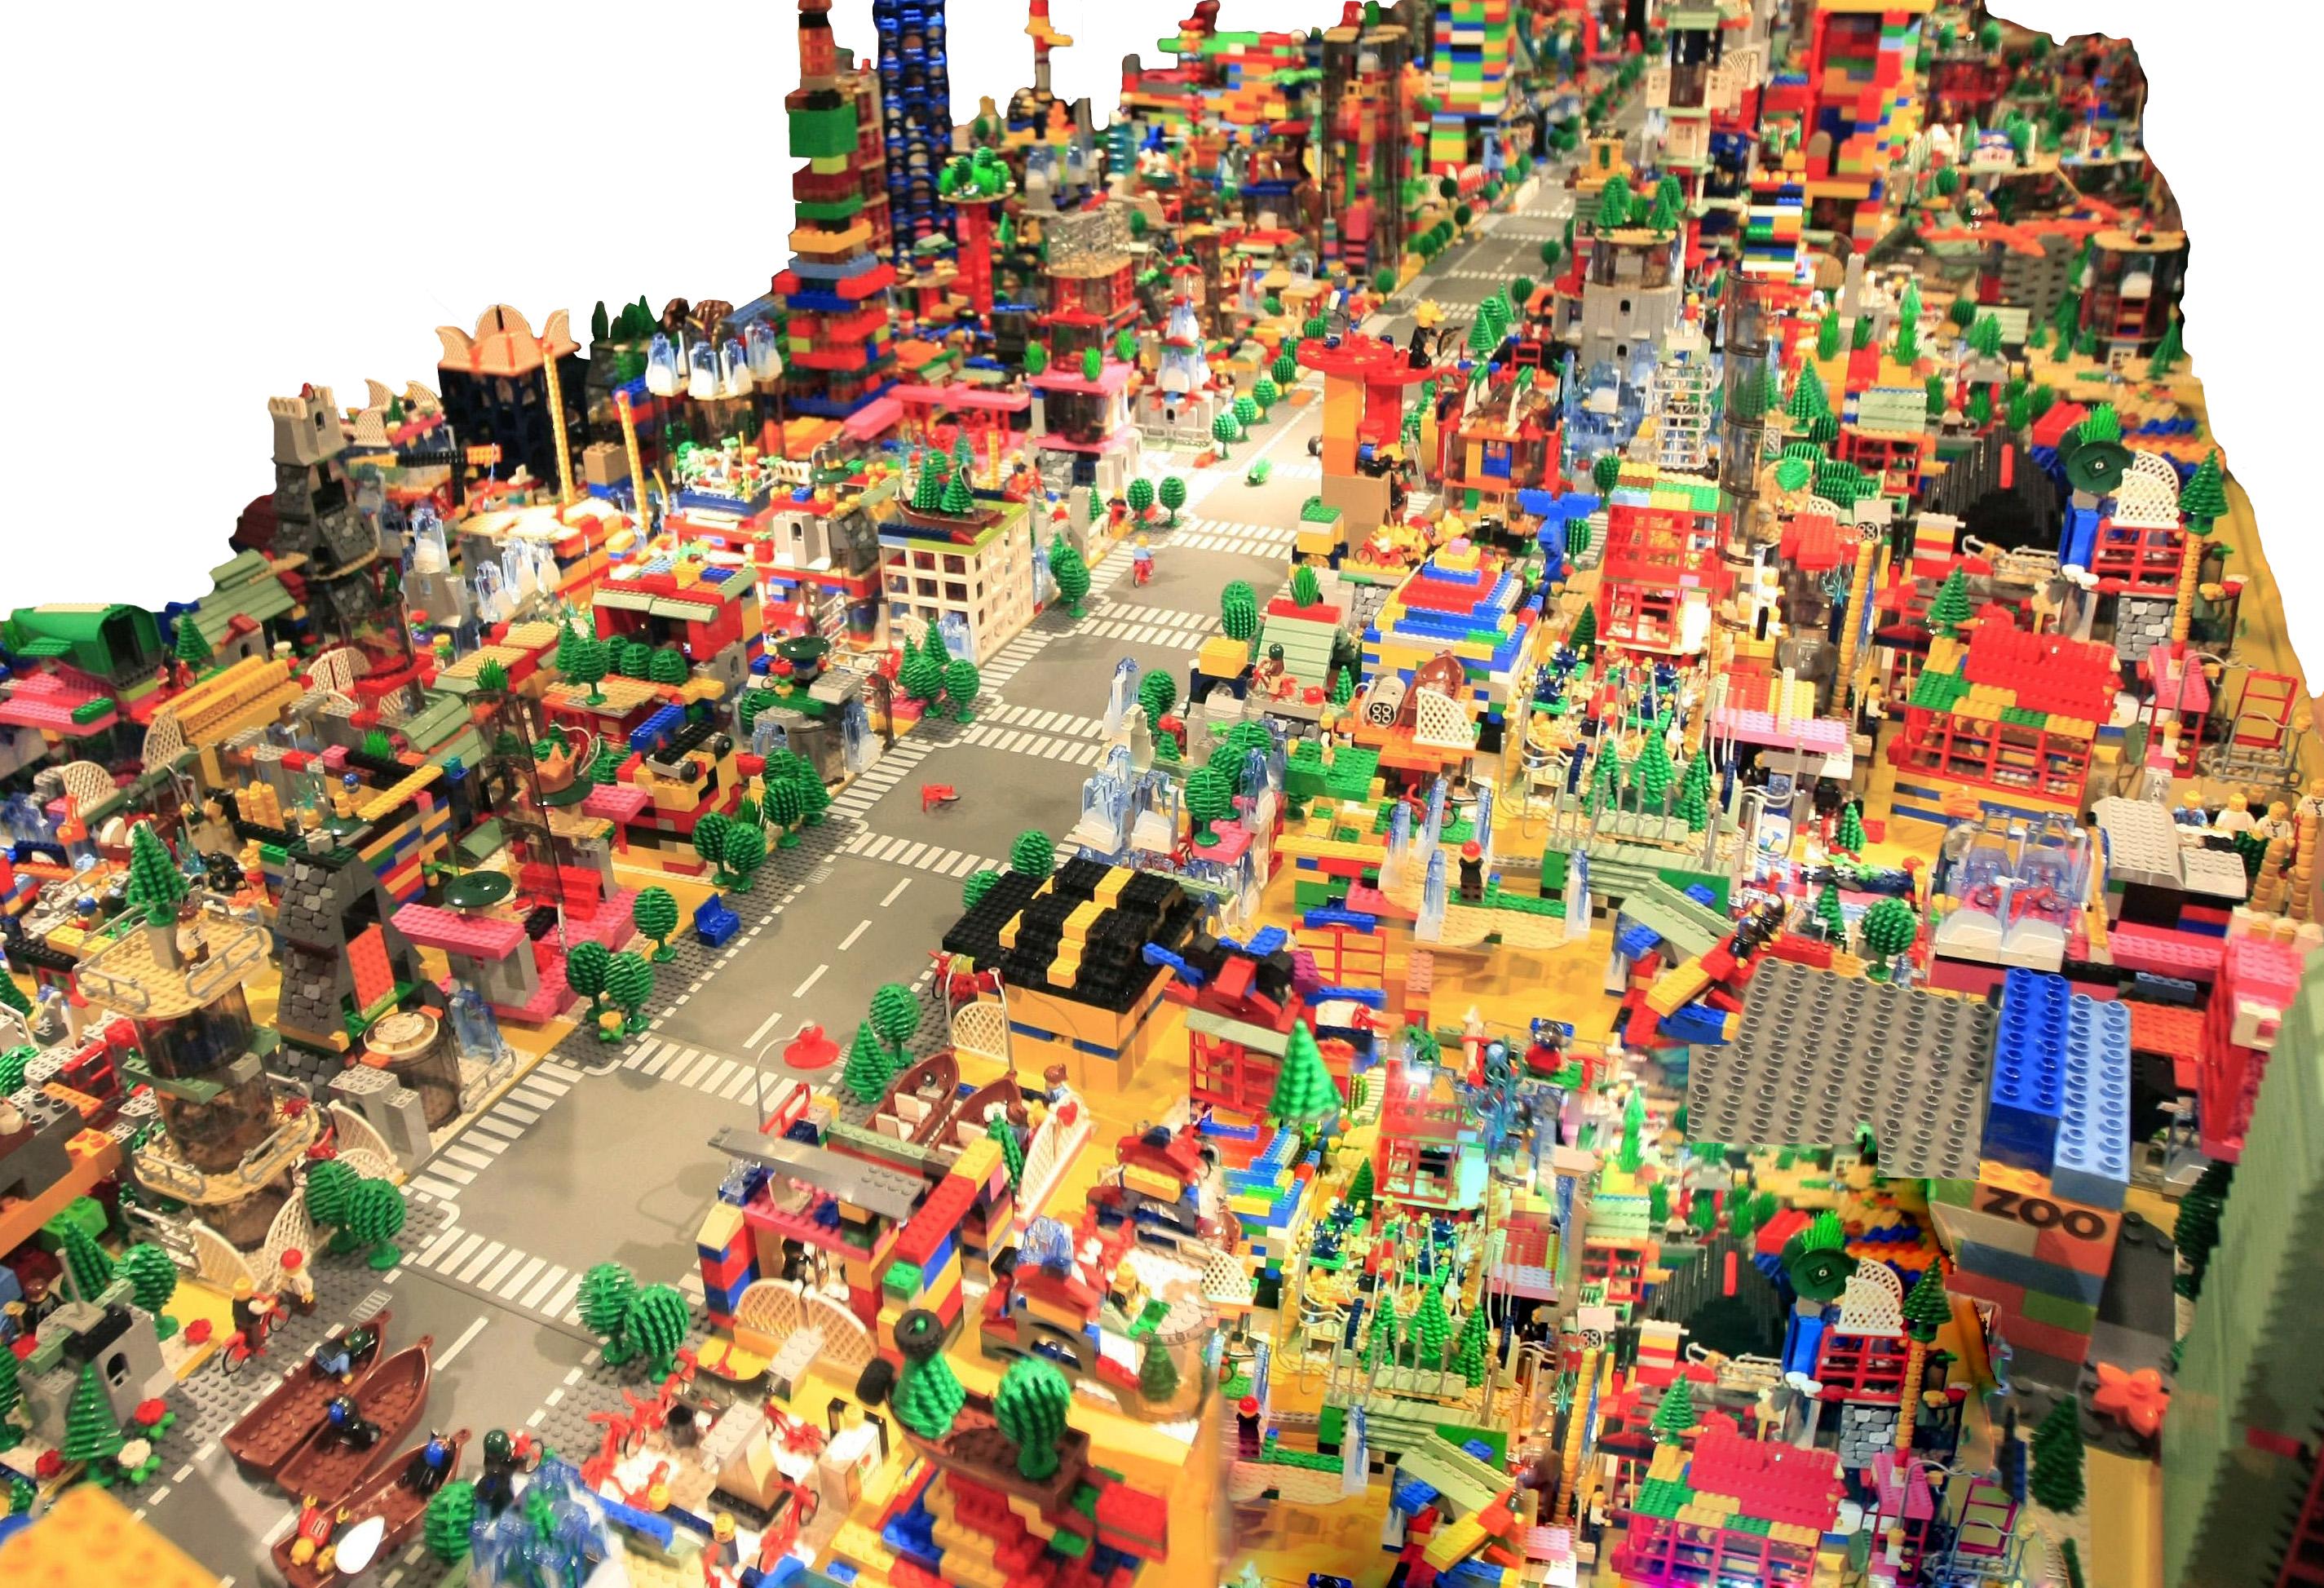 Lego city wallpaper wallpapersafari - Image lego city ...